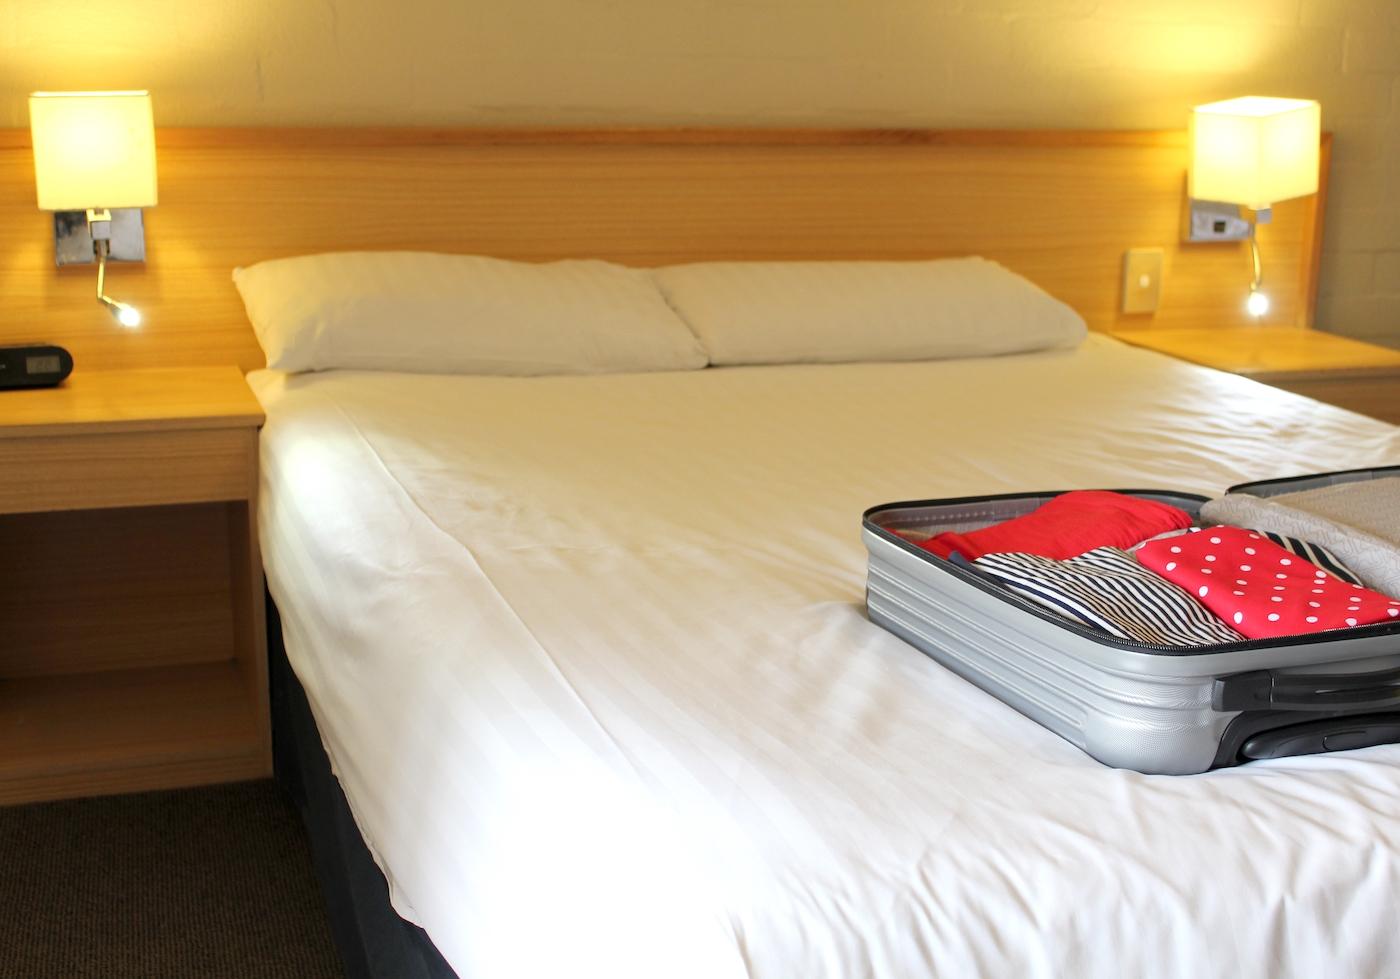 Airbnb Law